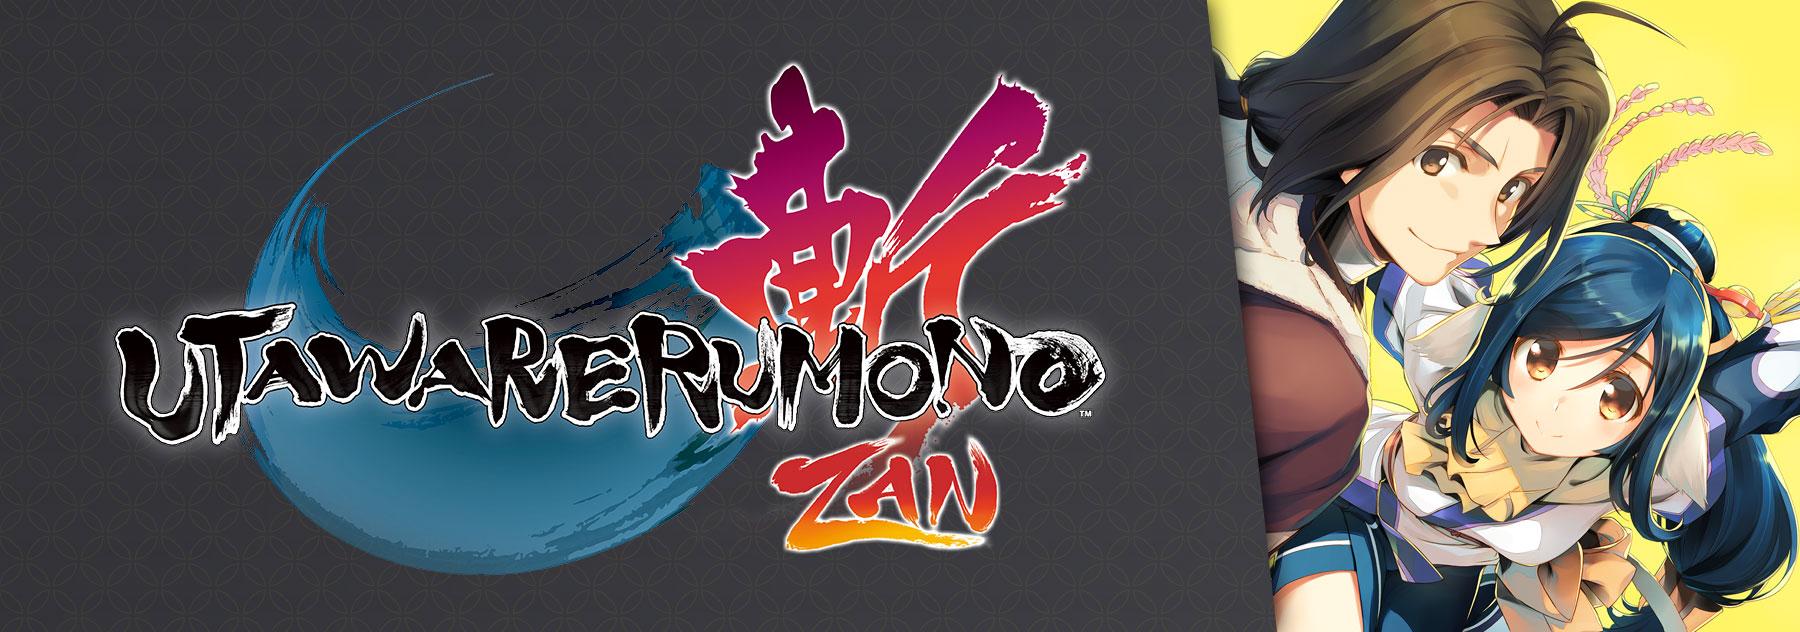 Read more about the article Utawarerumono Zan Review [PS4]